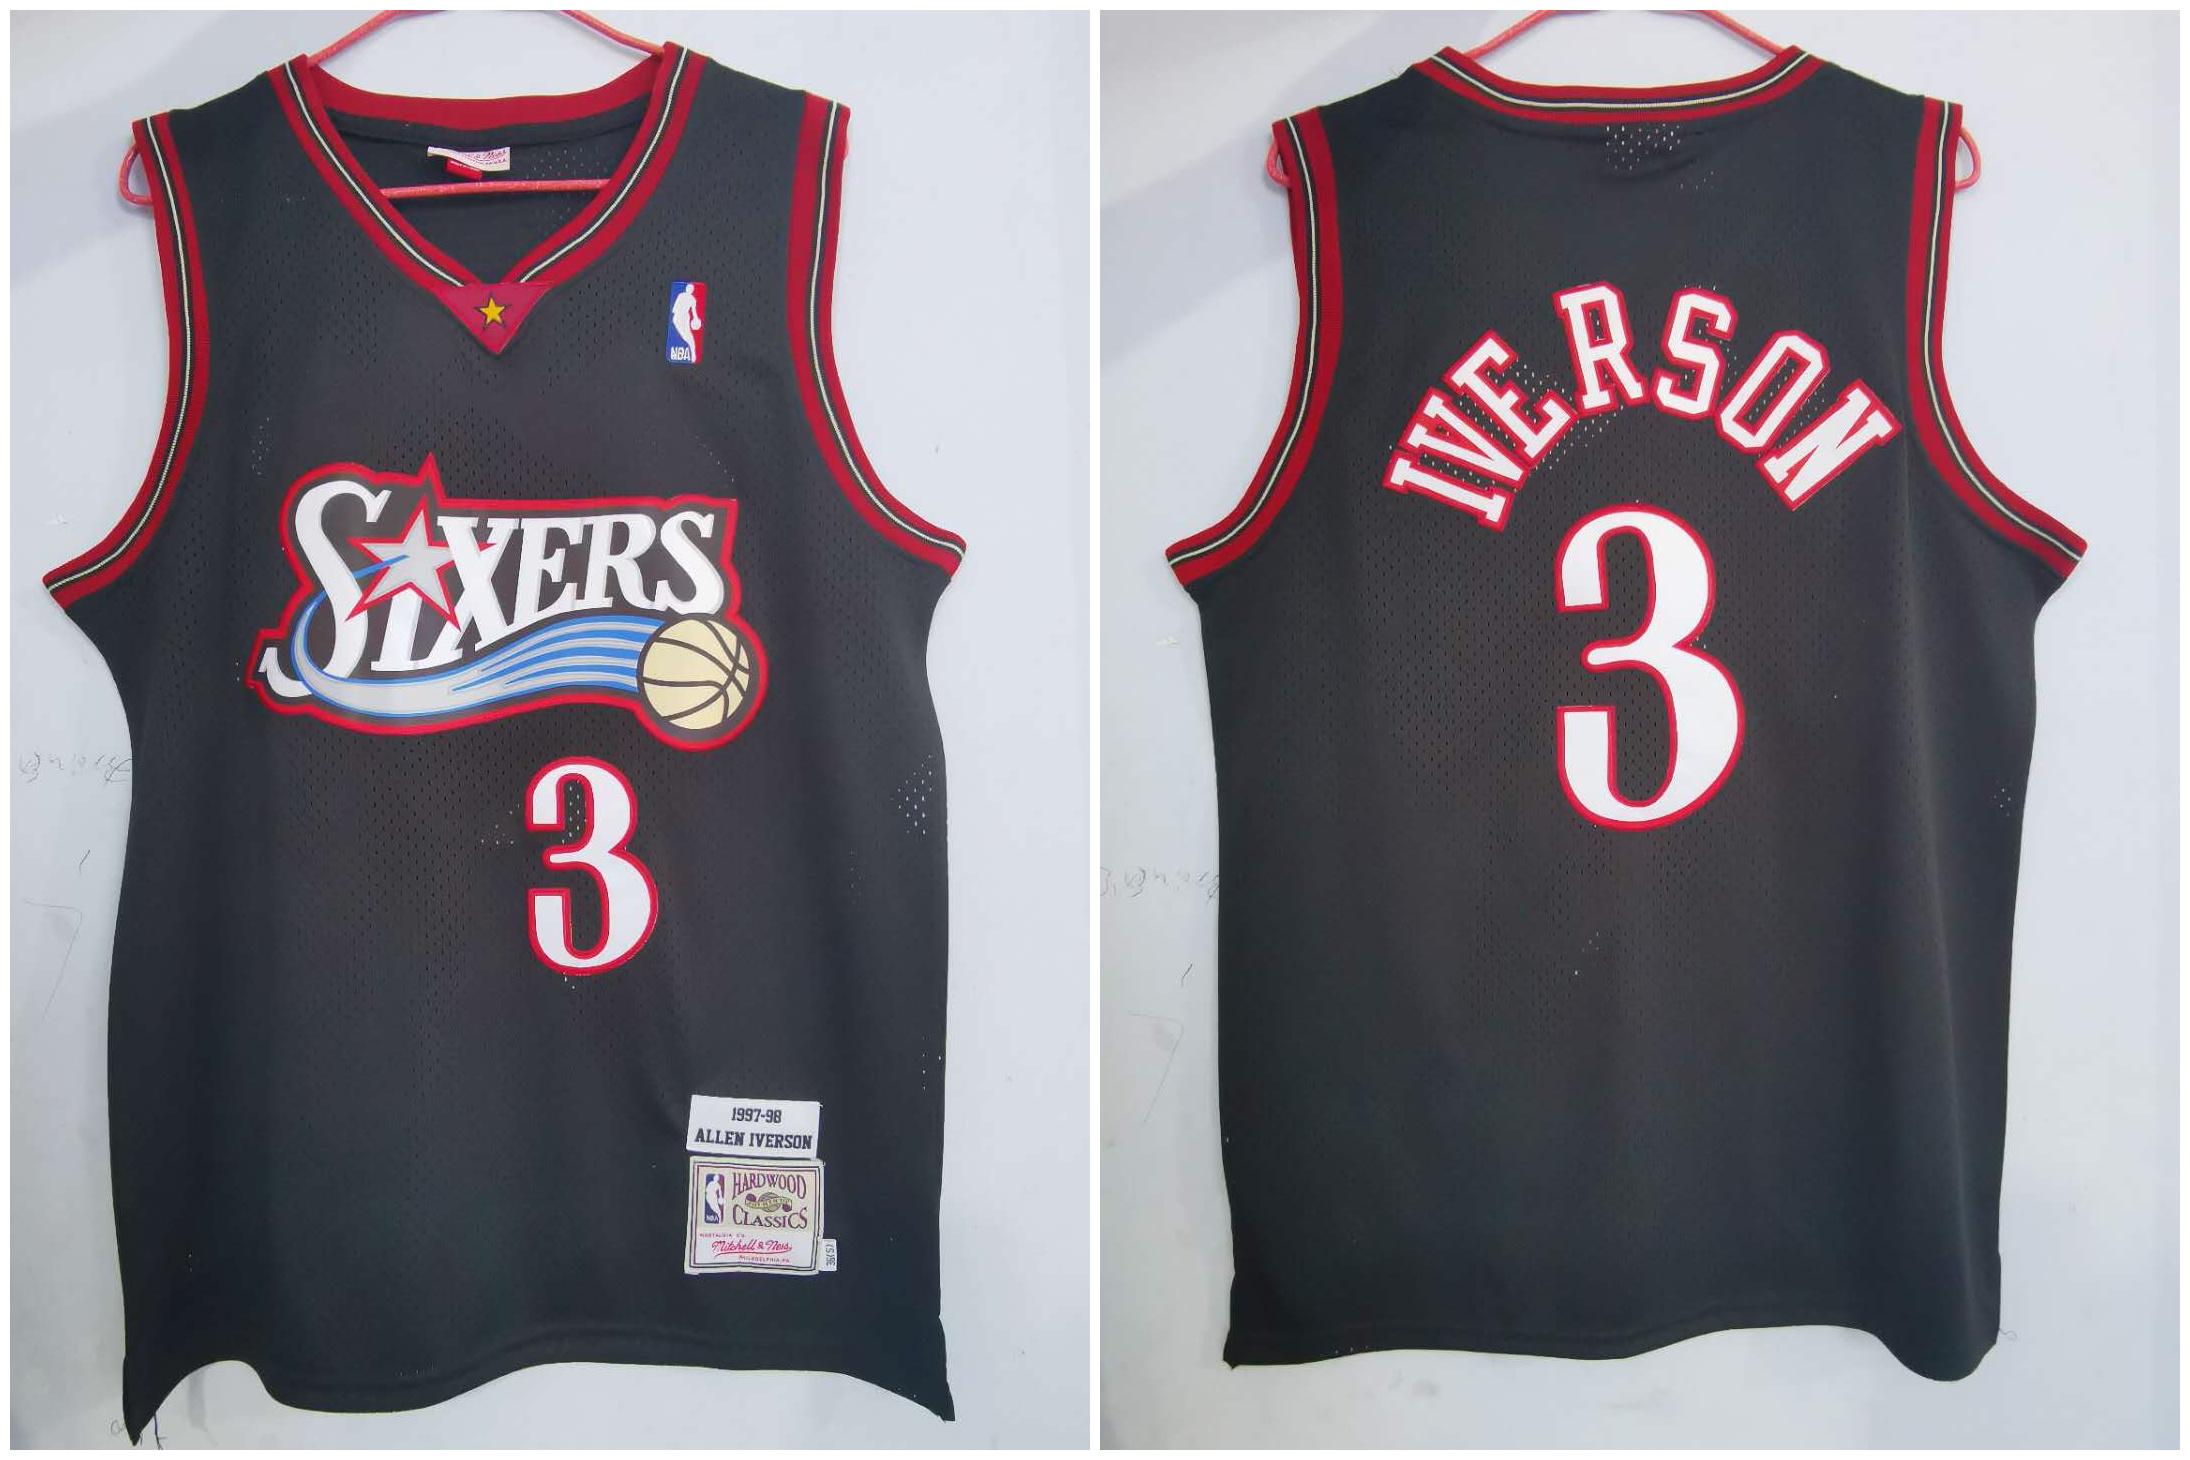 76ers 3 Allen Iverson Black 1997-98 Hardwood Classics Jersey